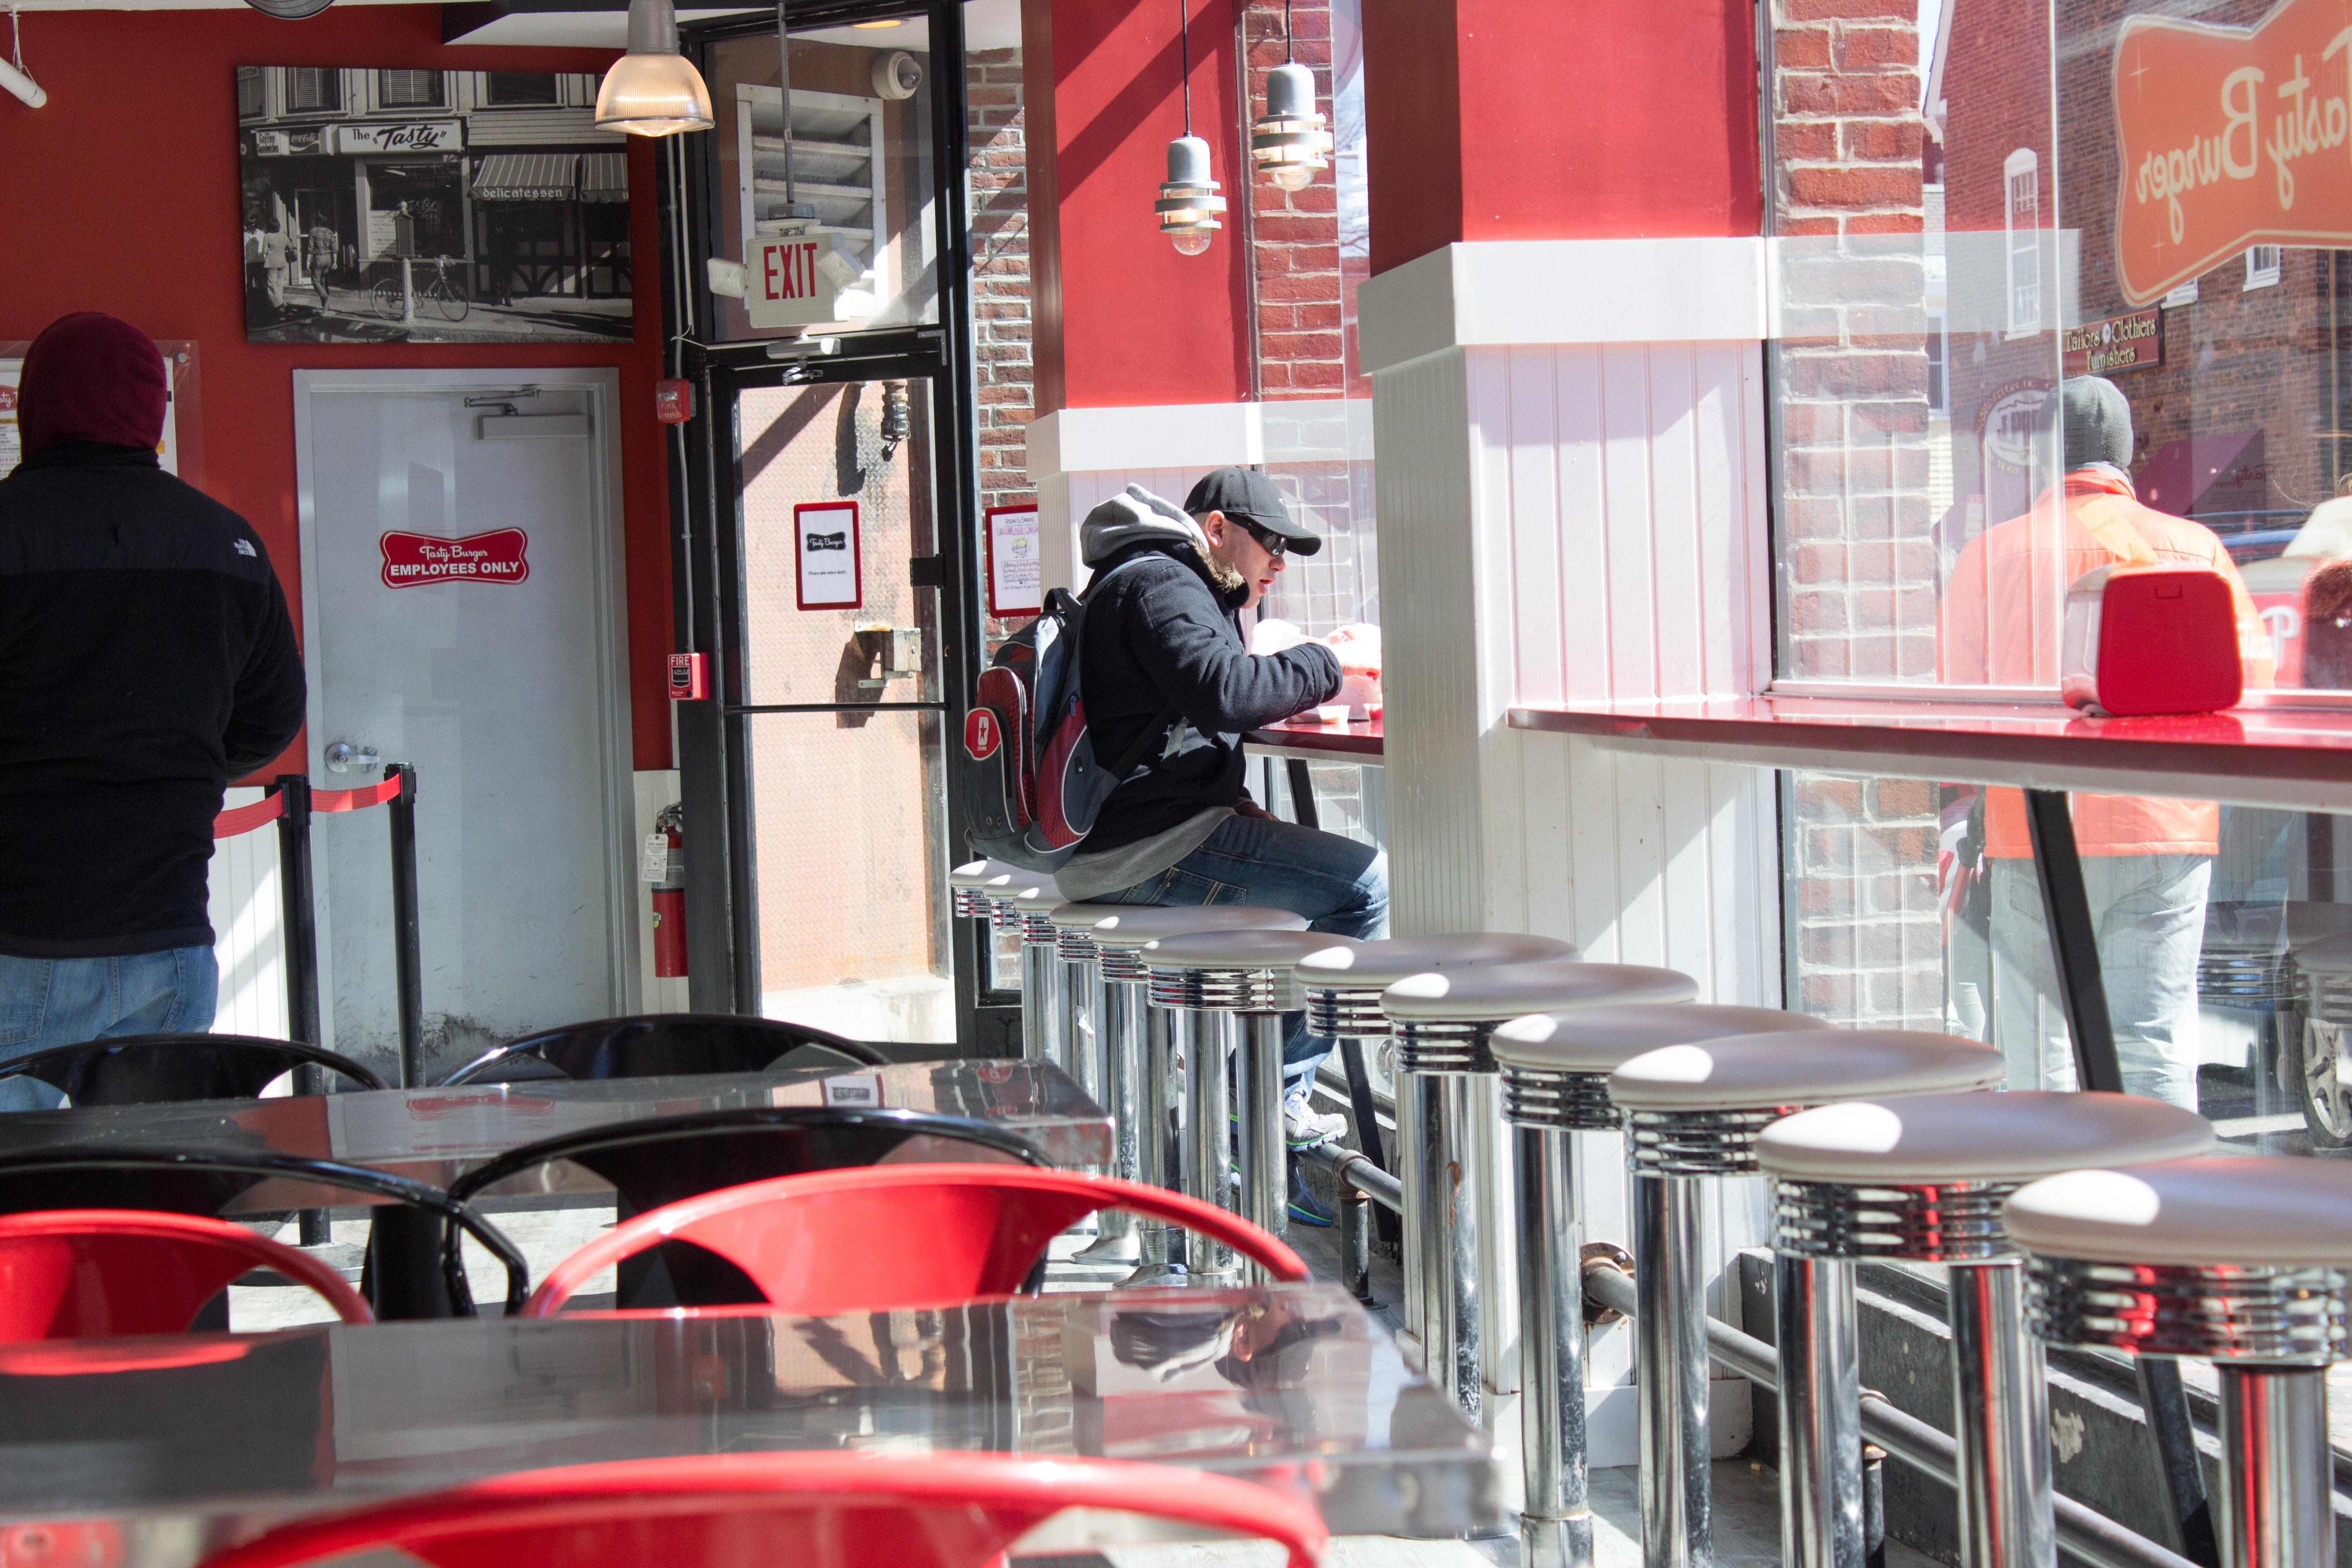 Tasty Burger Harvard Square